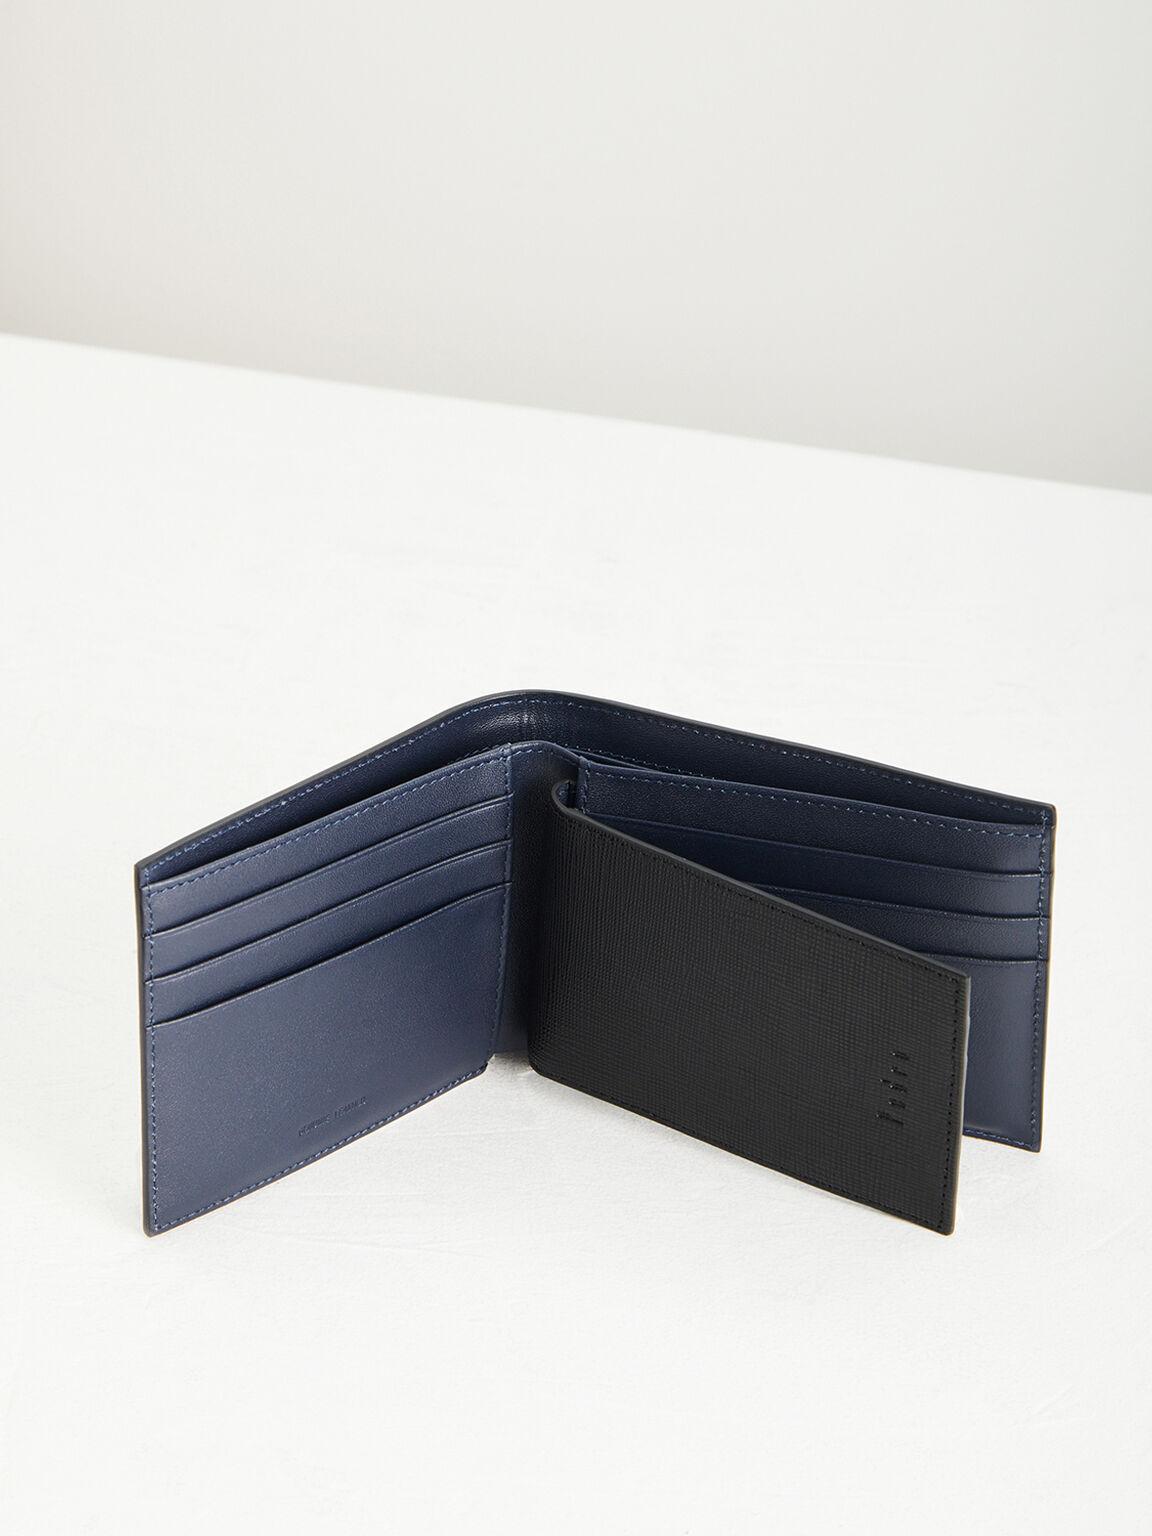 Leather Bi-Fold Wallet with Insert, Black, hi-res